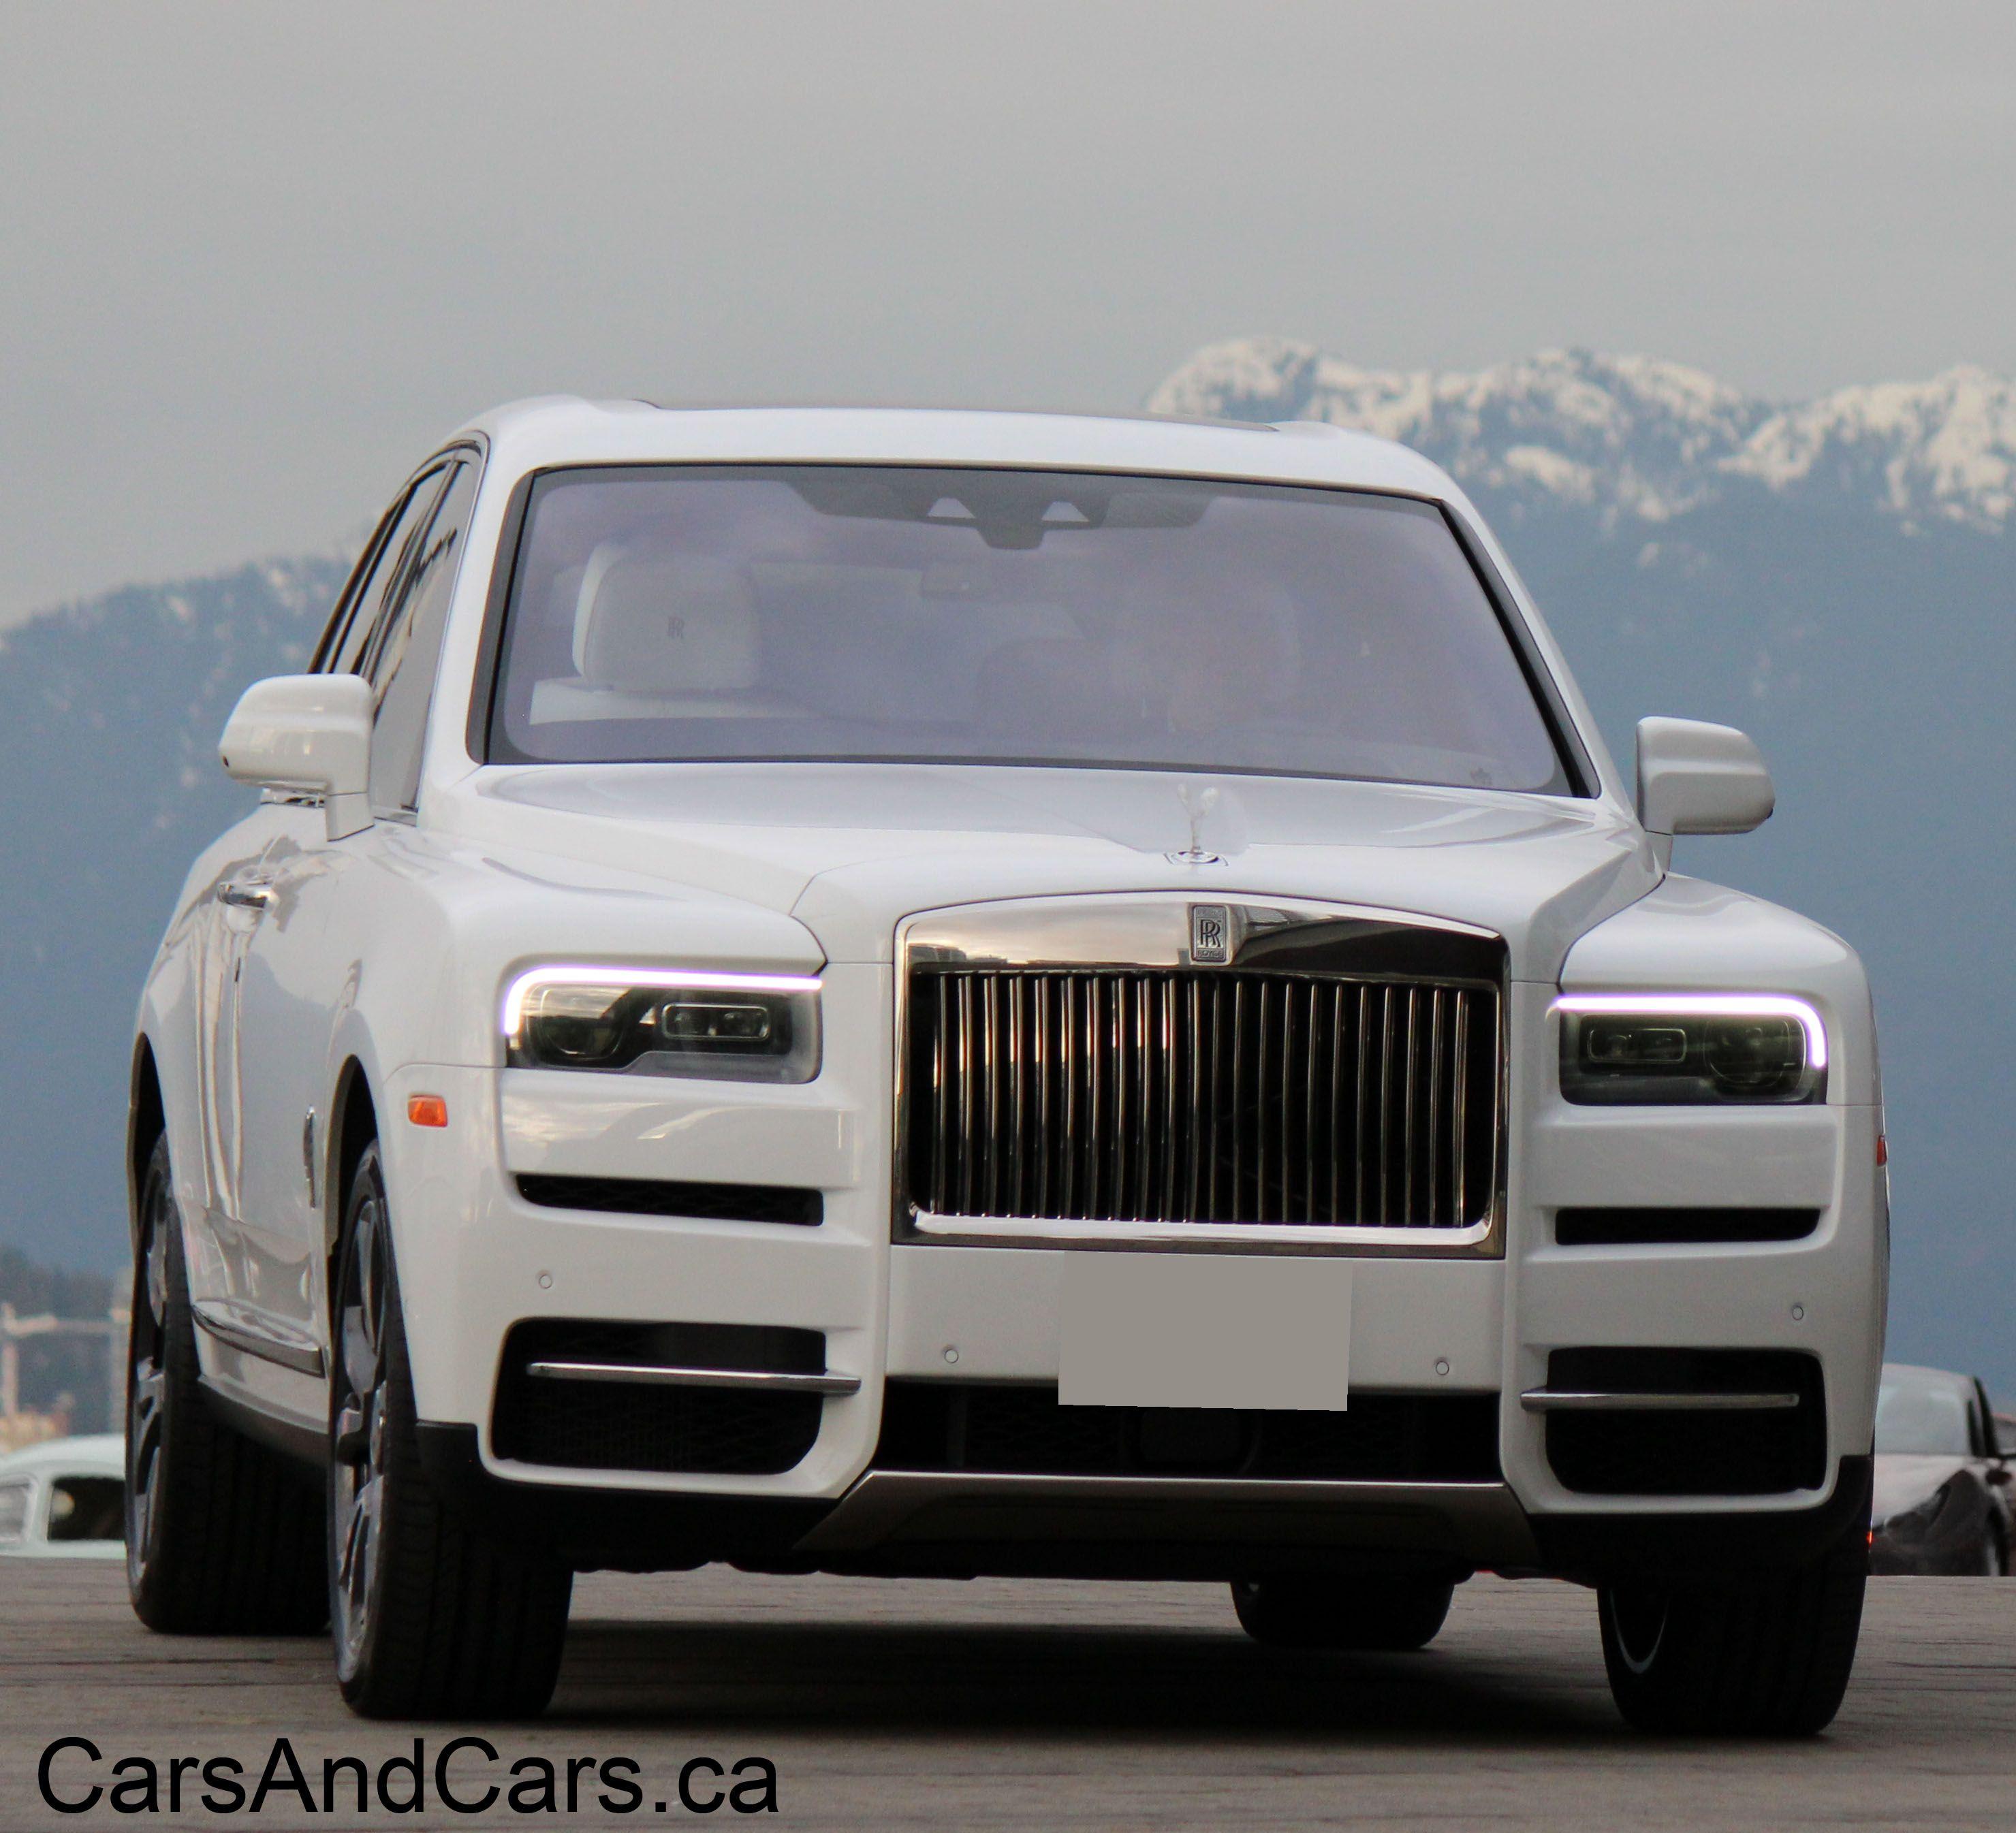 Used Rolls Royce For Sale >> Rolls Royce Cullinan Supercar Canada Carsandcars Ca